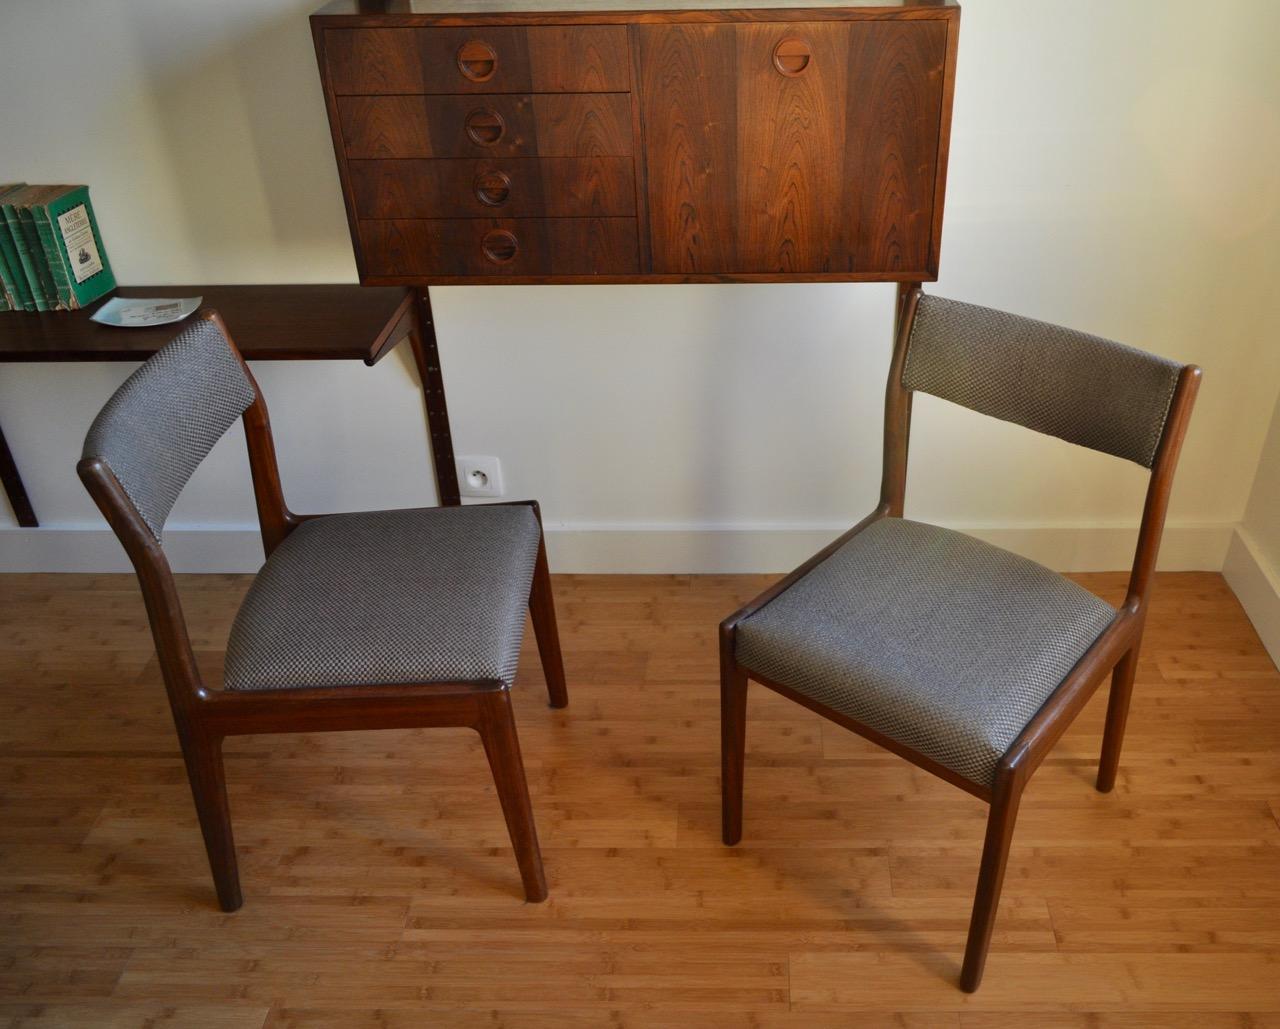 chaises de johannes andersen design danois atelier secrea. Black Bedroom Furniture Sets. Home Design Ideas